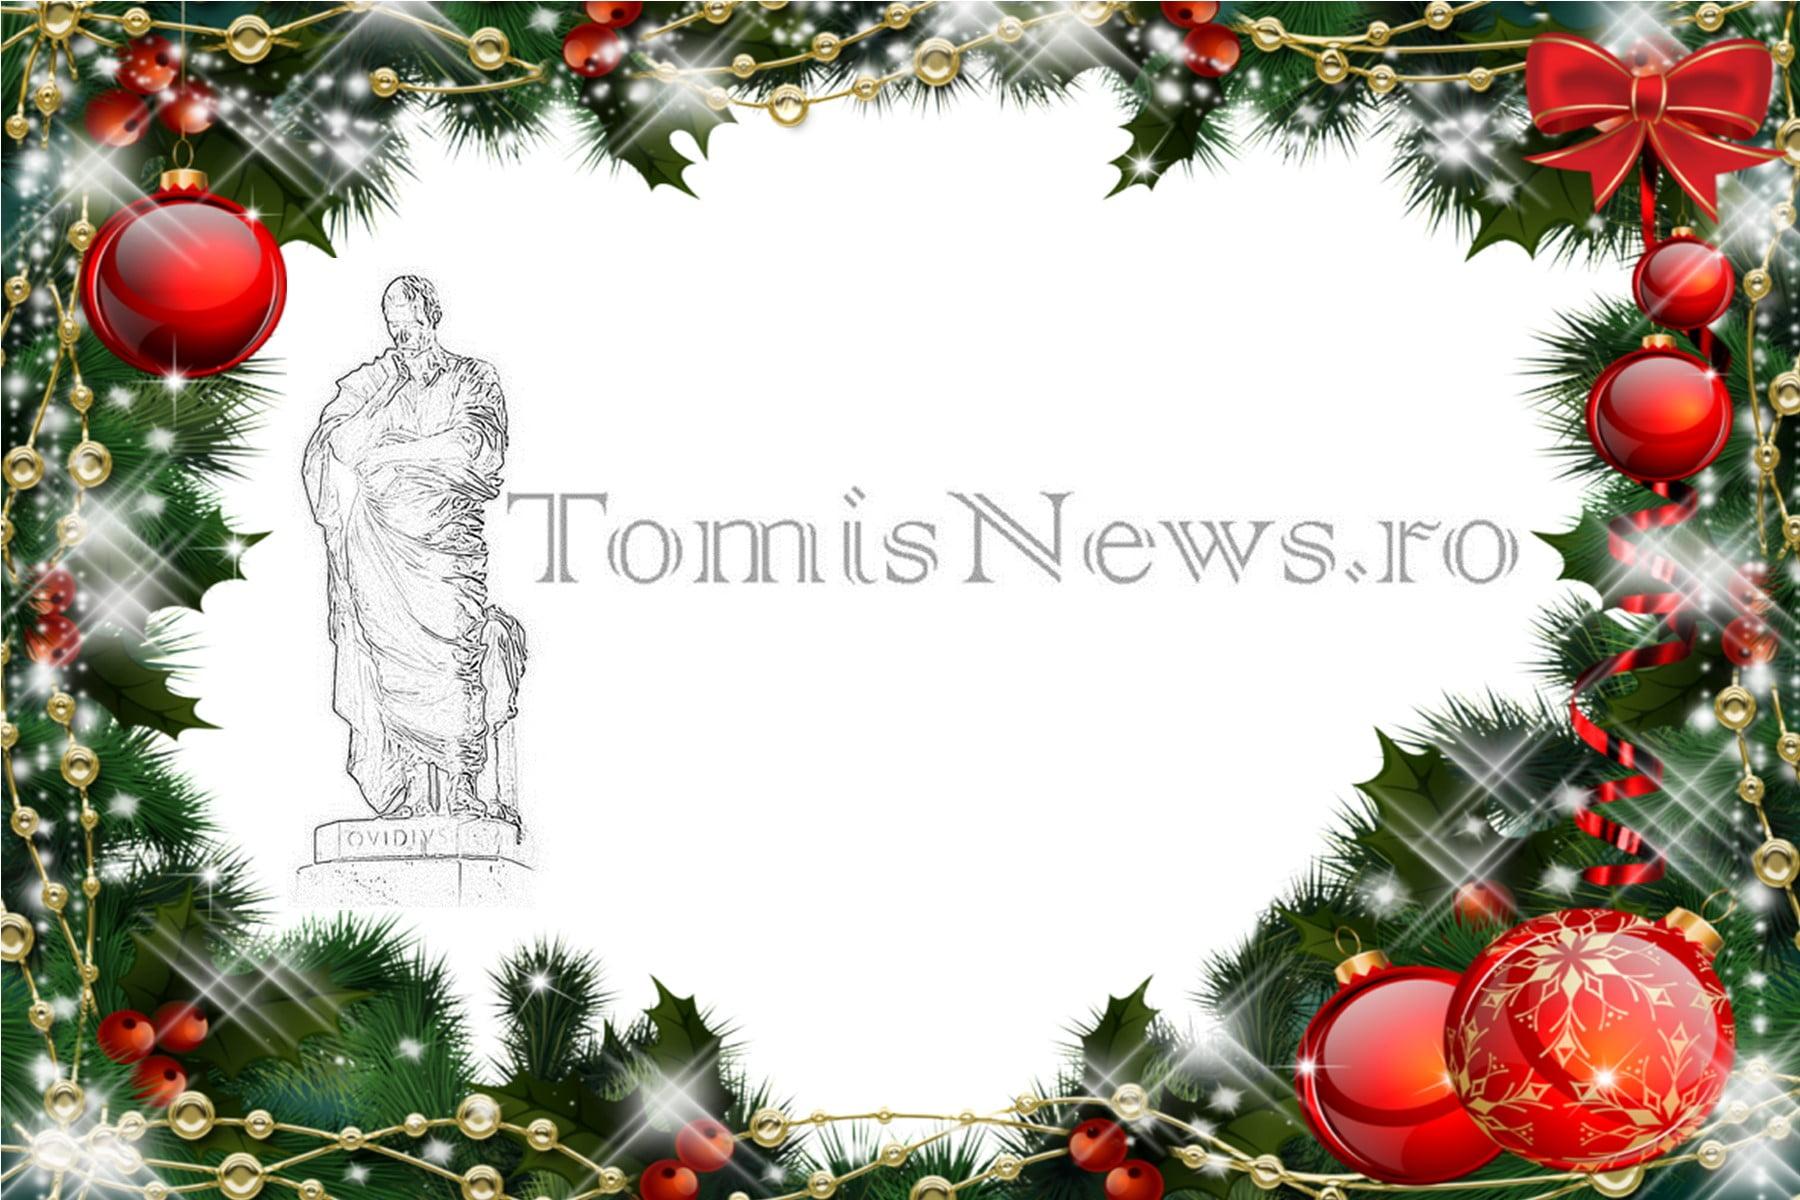 TOMIS NEWS